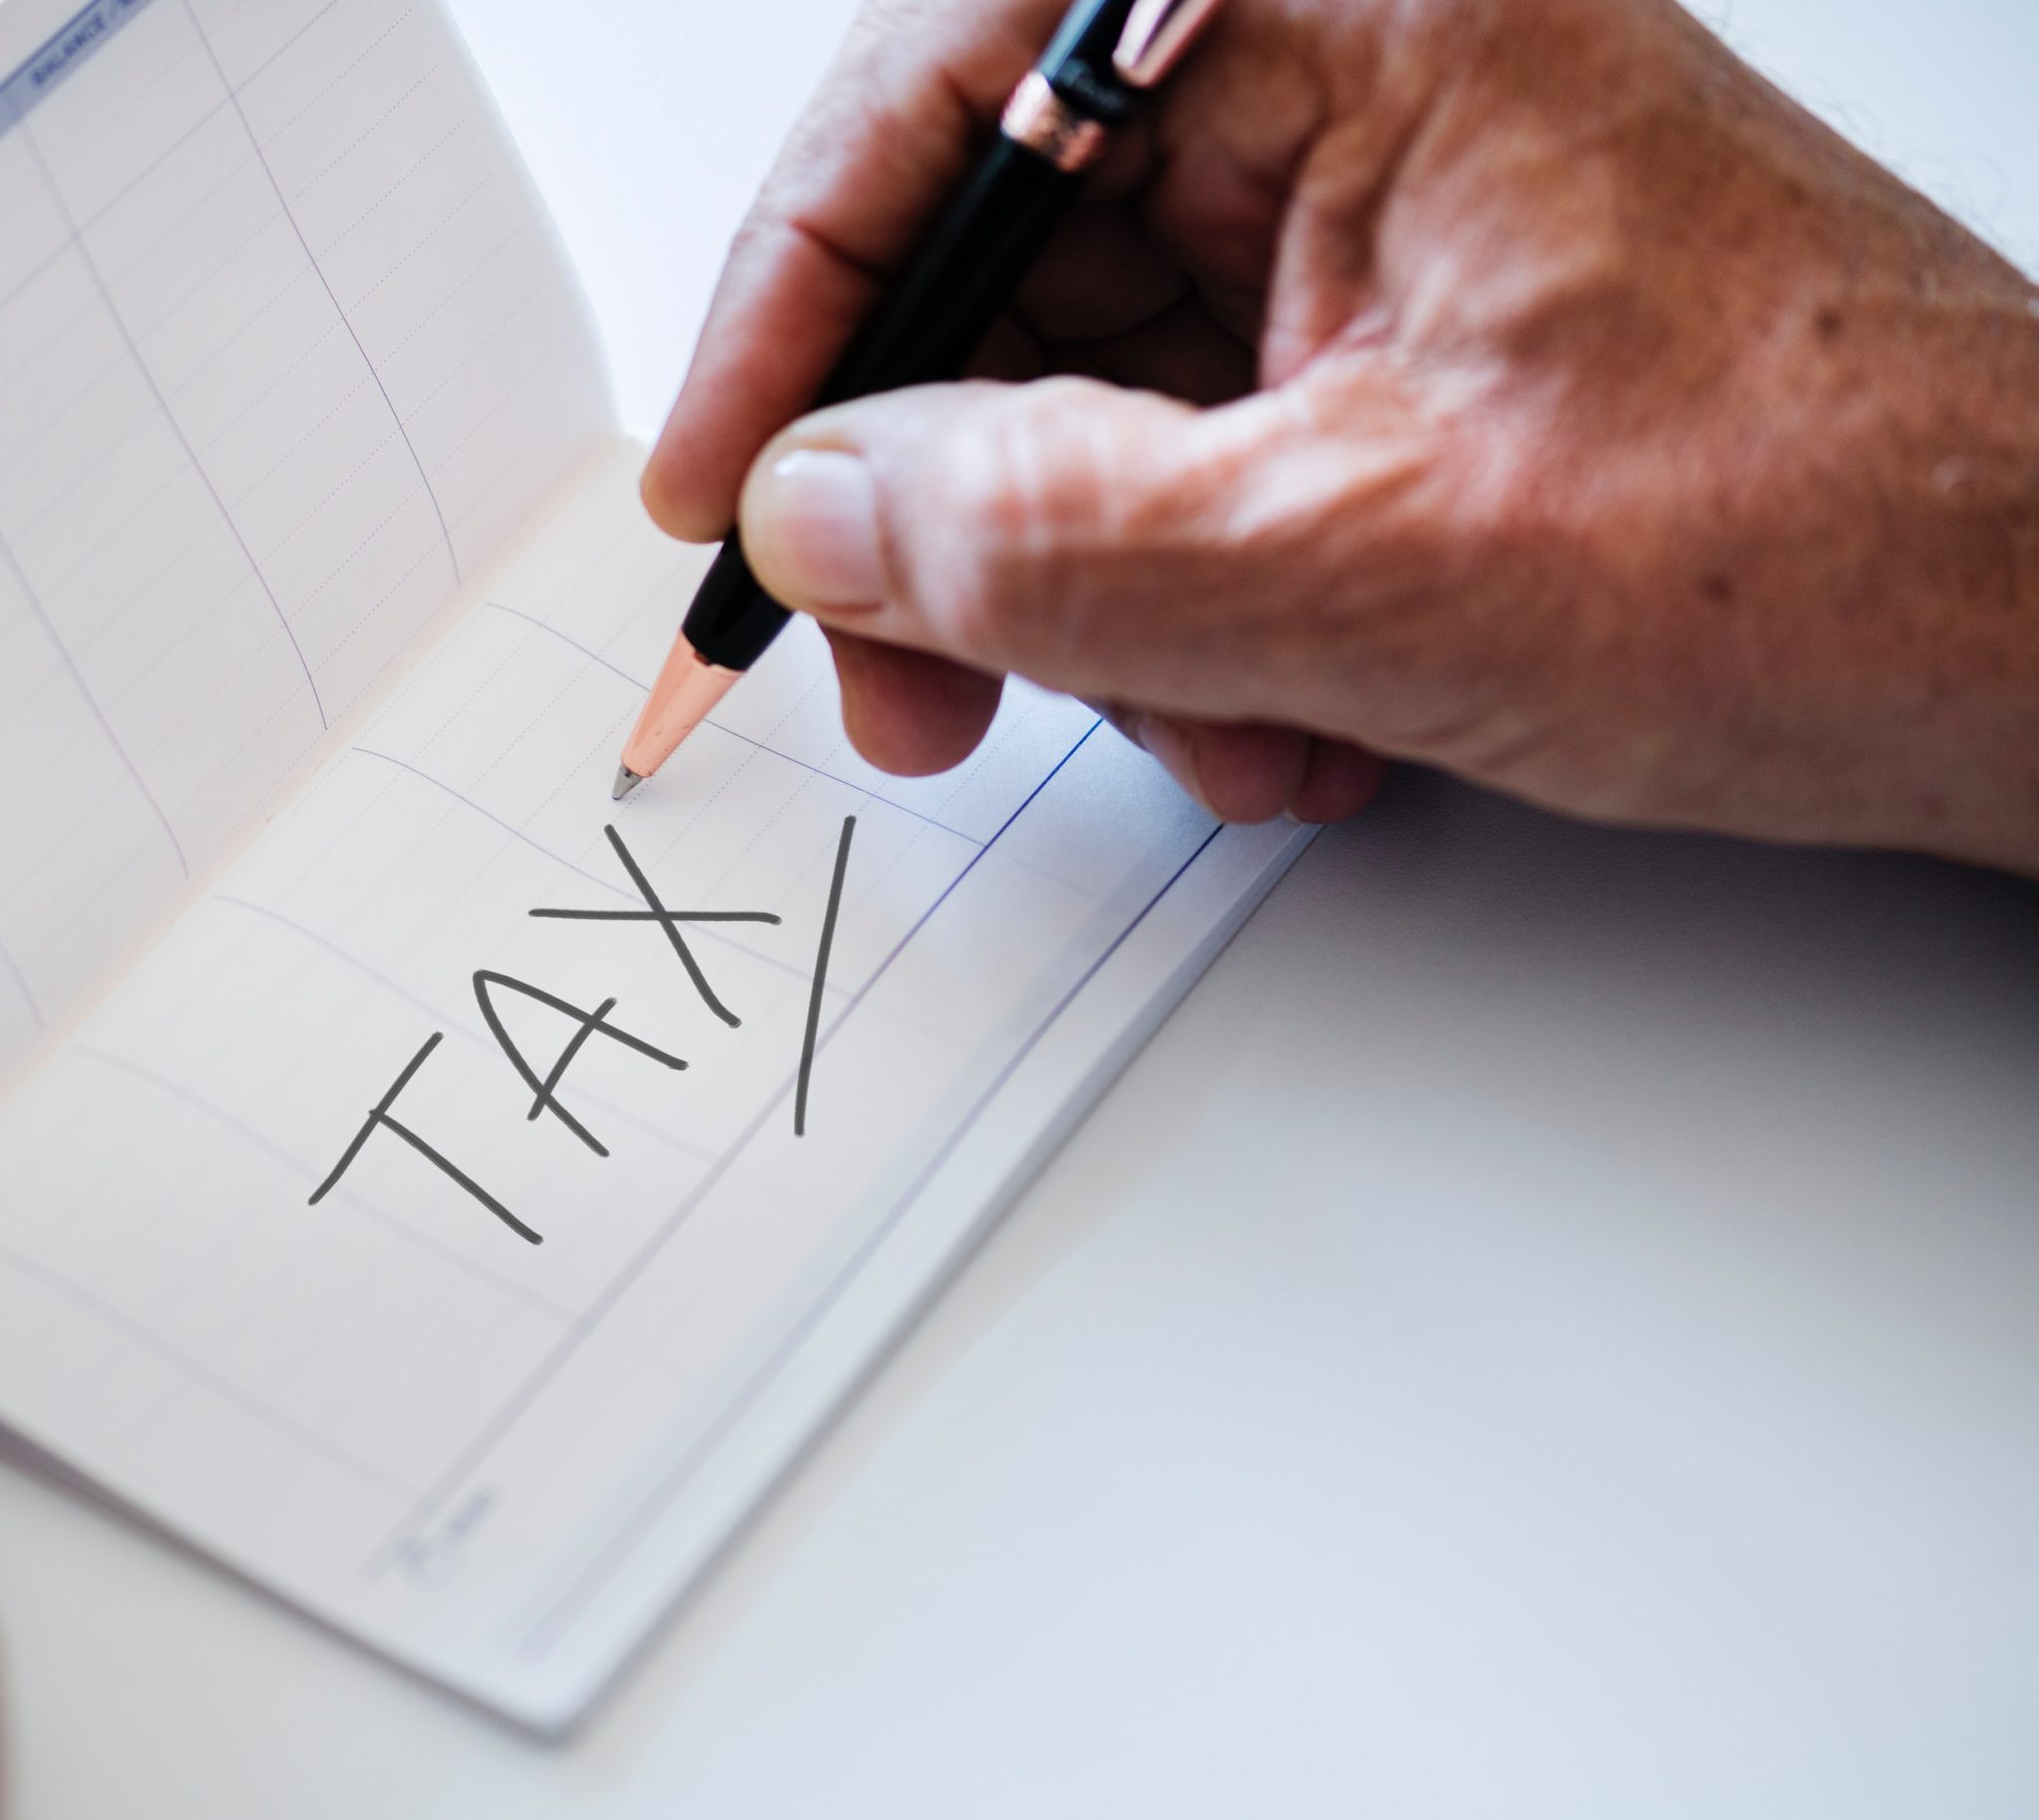 Owe tax to HMRC - Tax Services